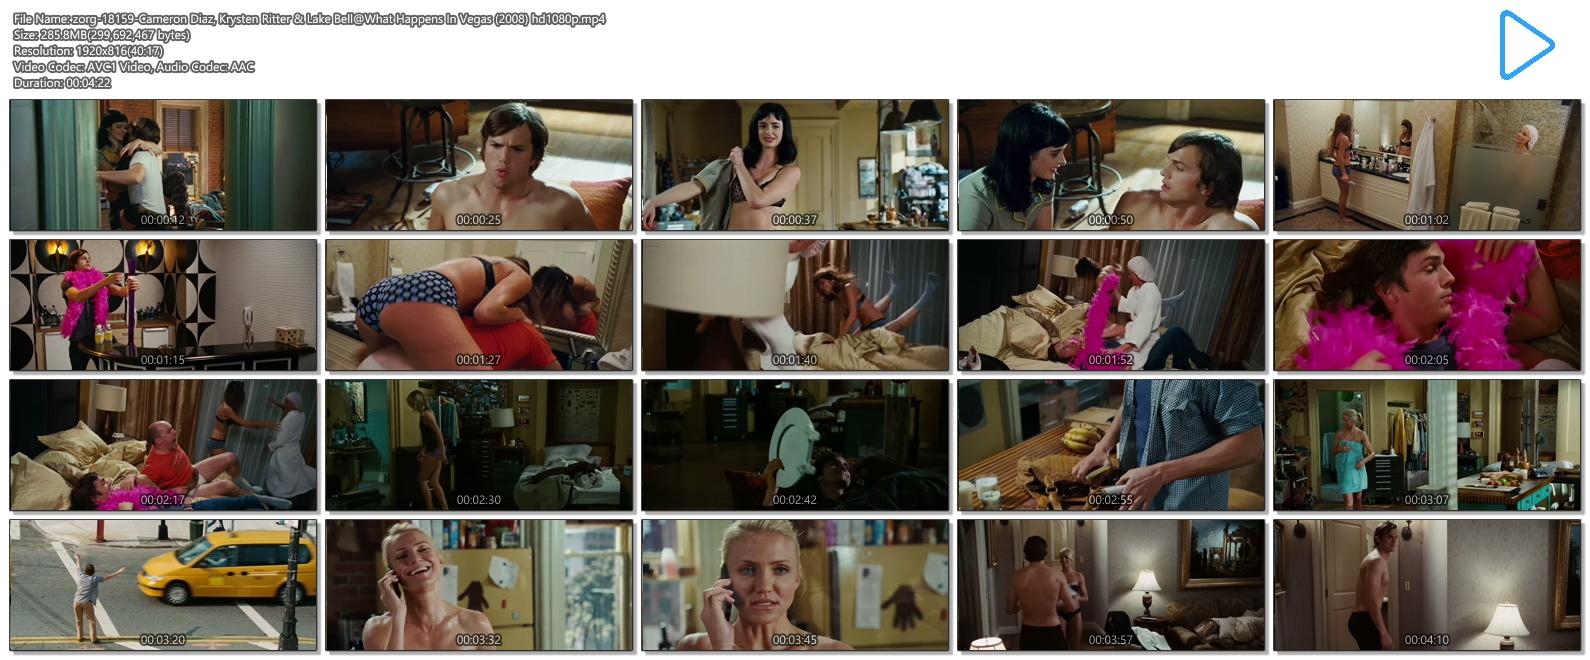 Cameron Diaz hot Krysten Ritter lingerie and Lake Bell hot in undies - What Happens In Vegas (2008) hd1080p (14)